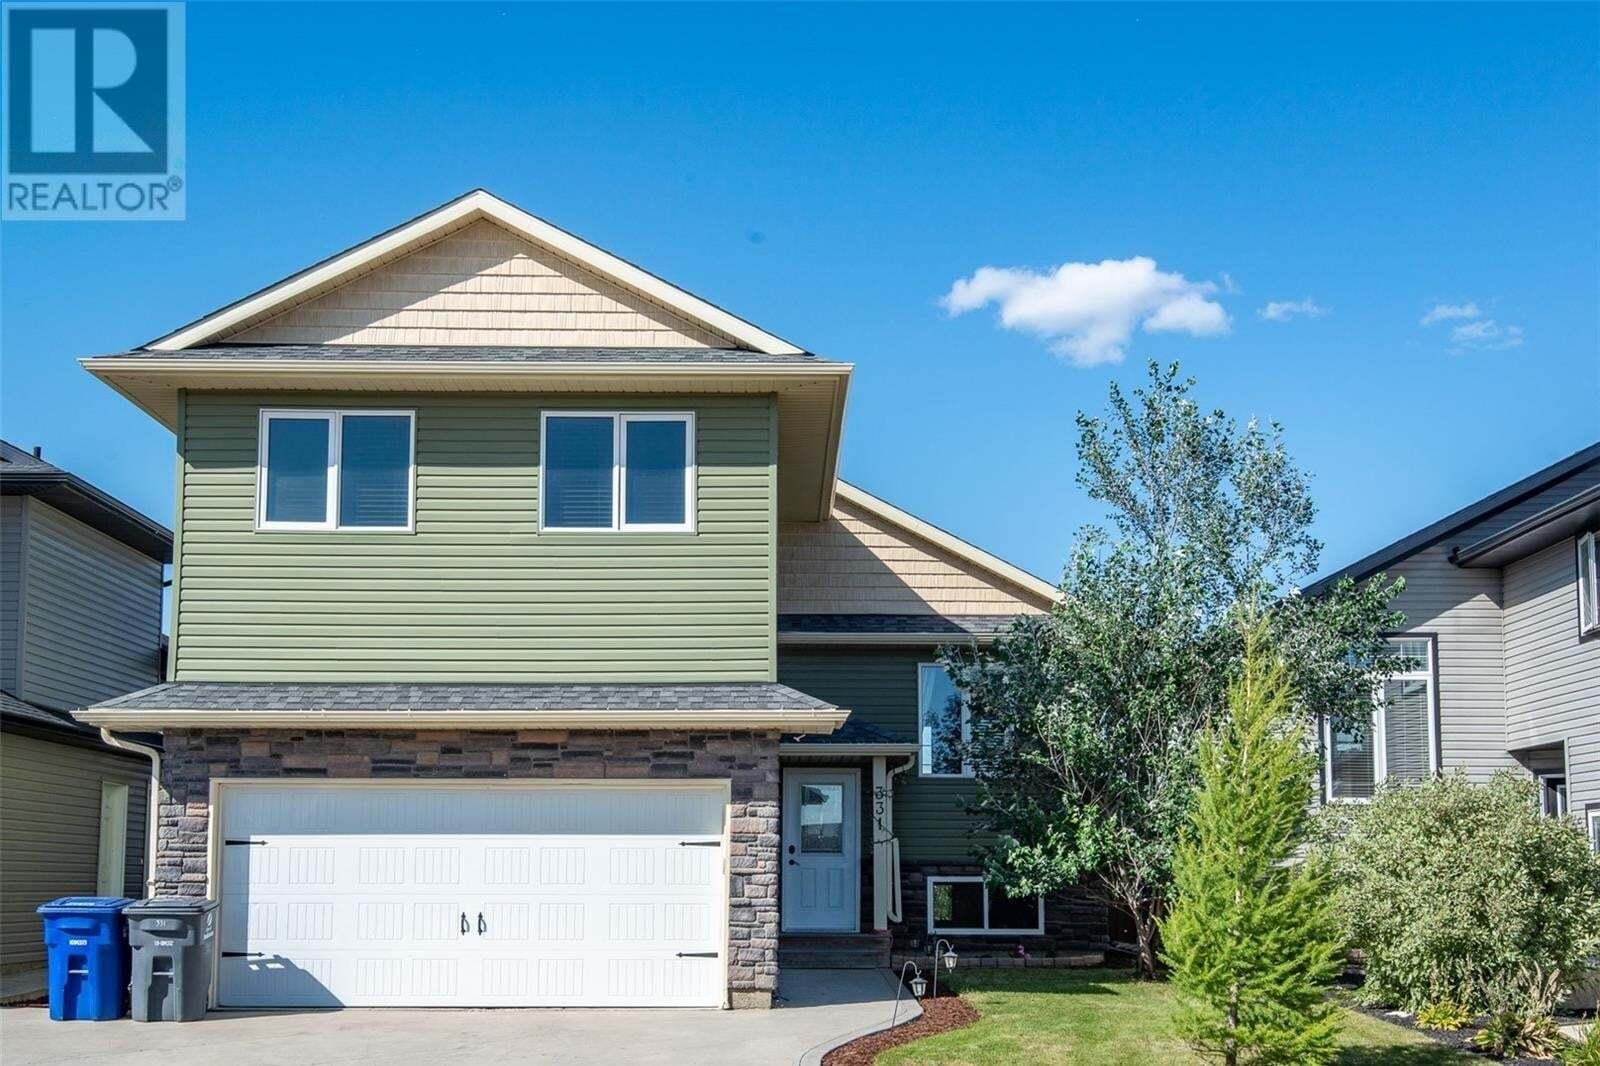 House for sale at 331 Klassen Cres Saskatoon Saskatchewan - MLS: SK813457